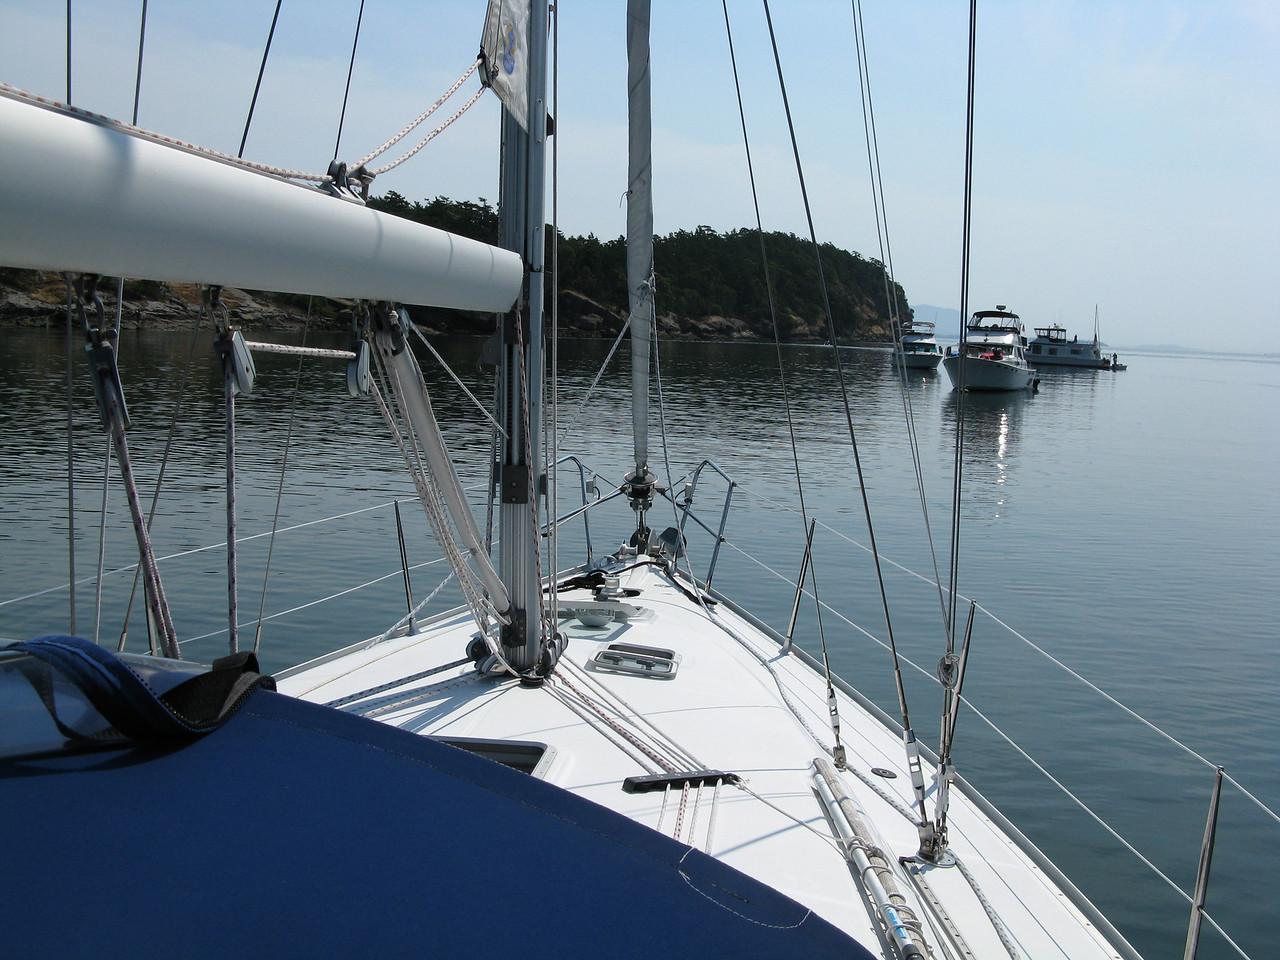 09 07 26-08 02 Sail SJ 232